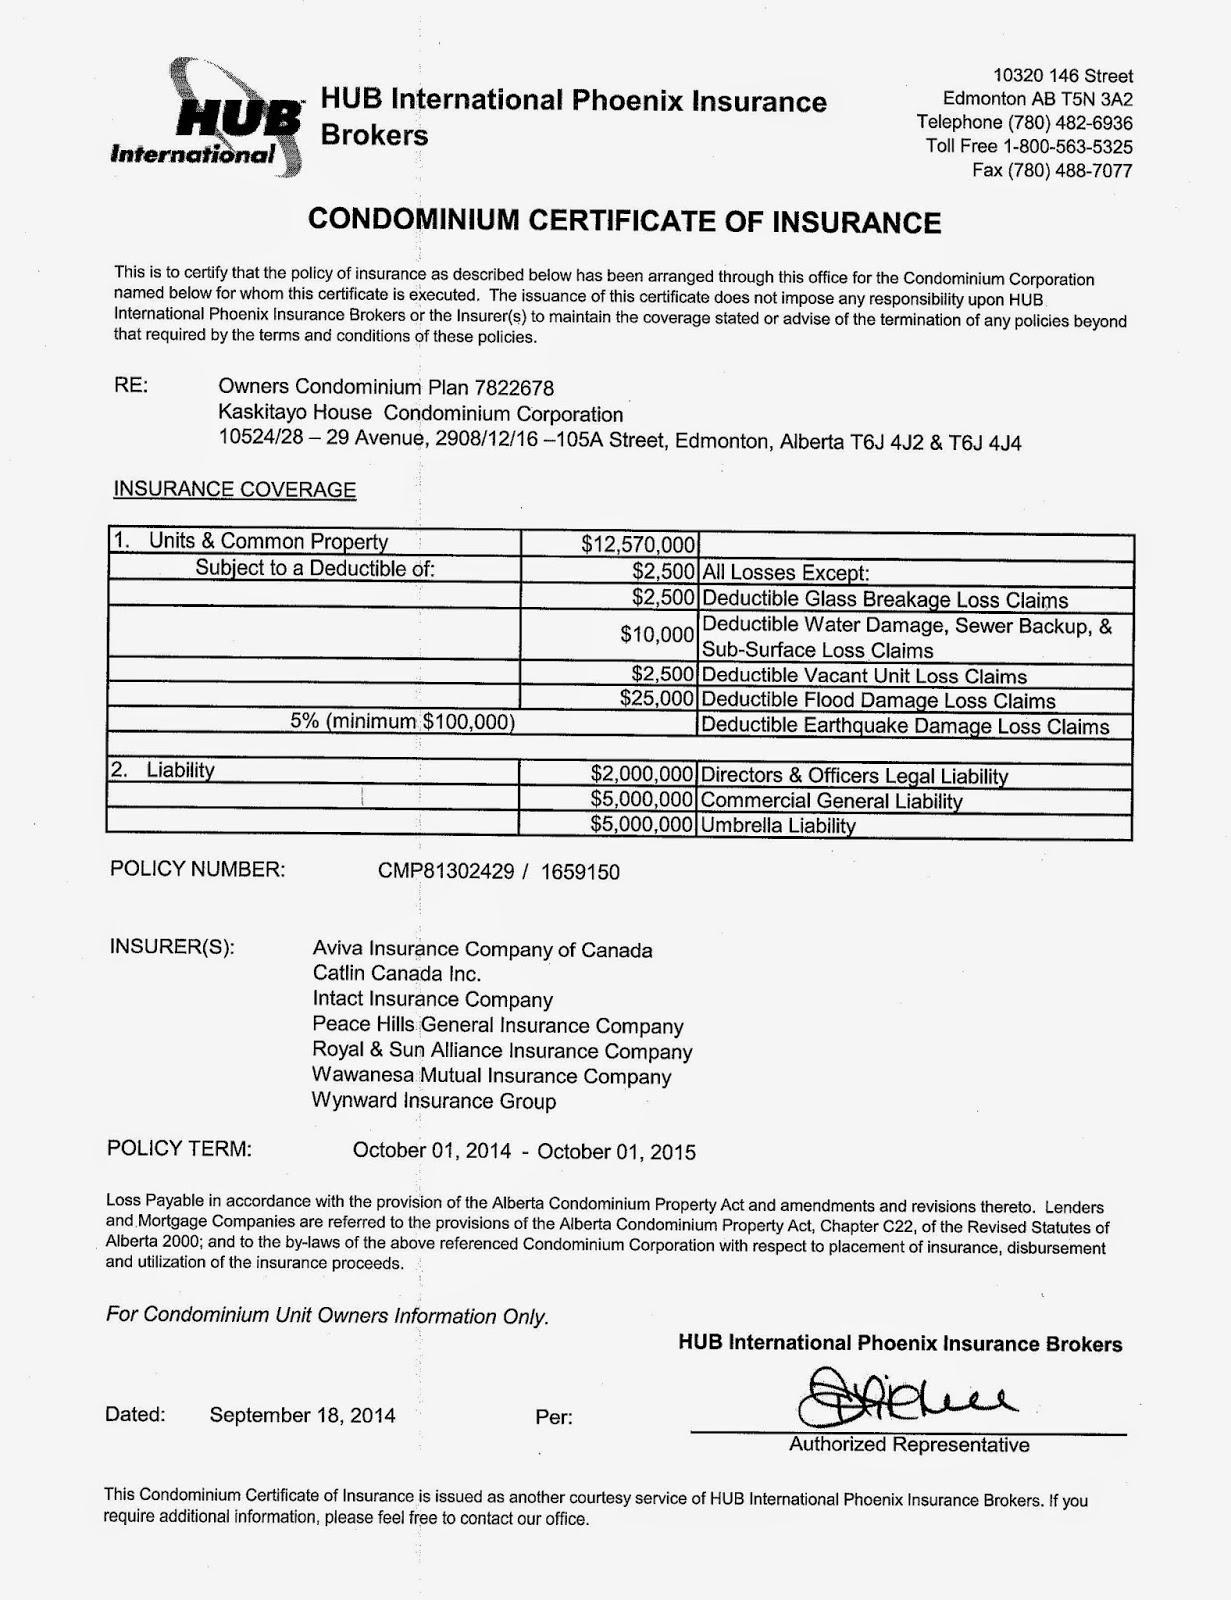 Kaskitayo House Insurance Certificate